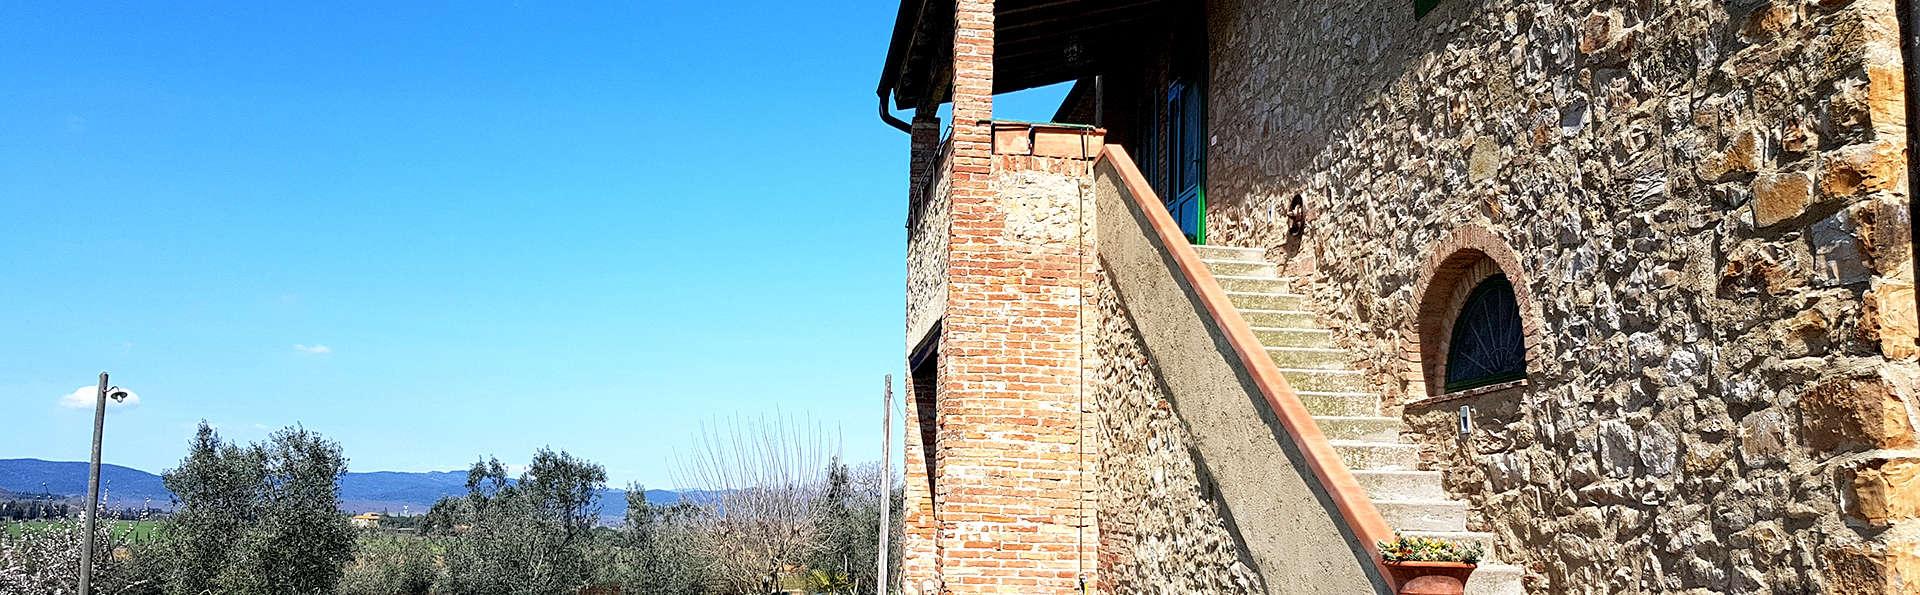 Agriturismo Casa Montecucco - EDIT_NEW_FRONT2.jpg